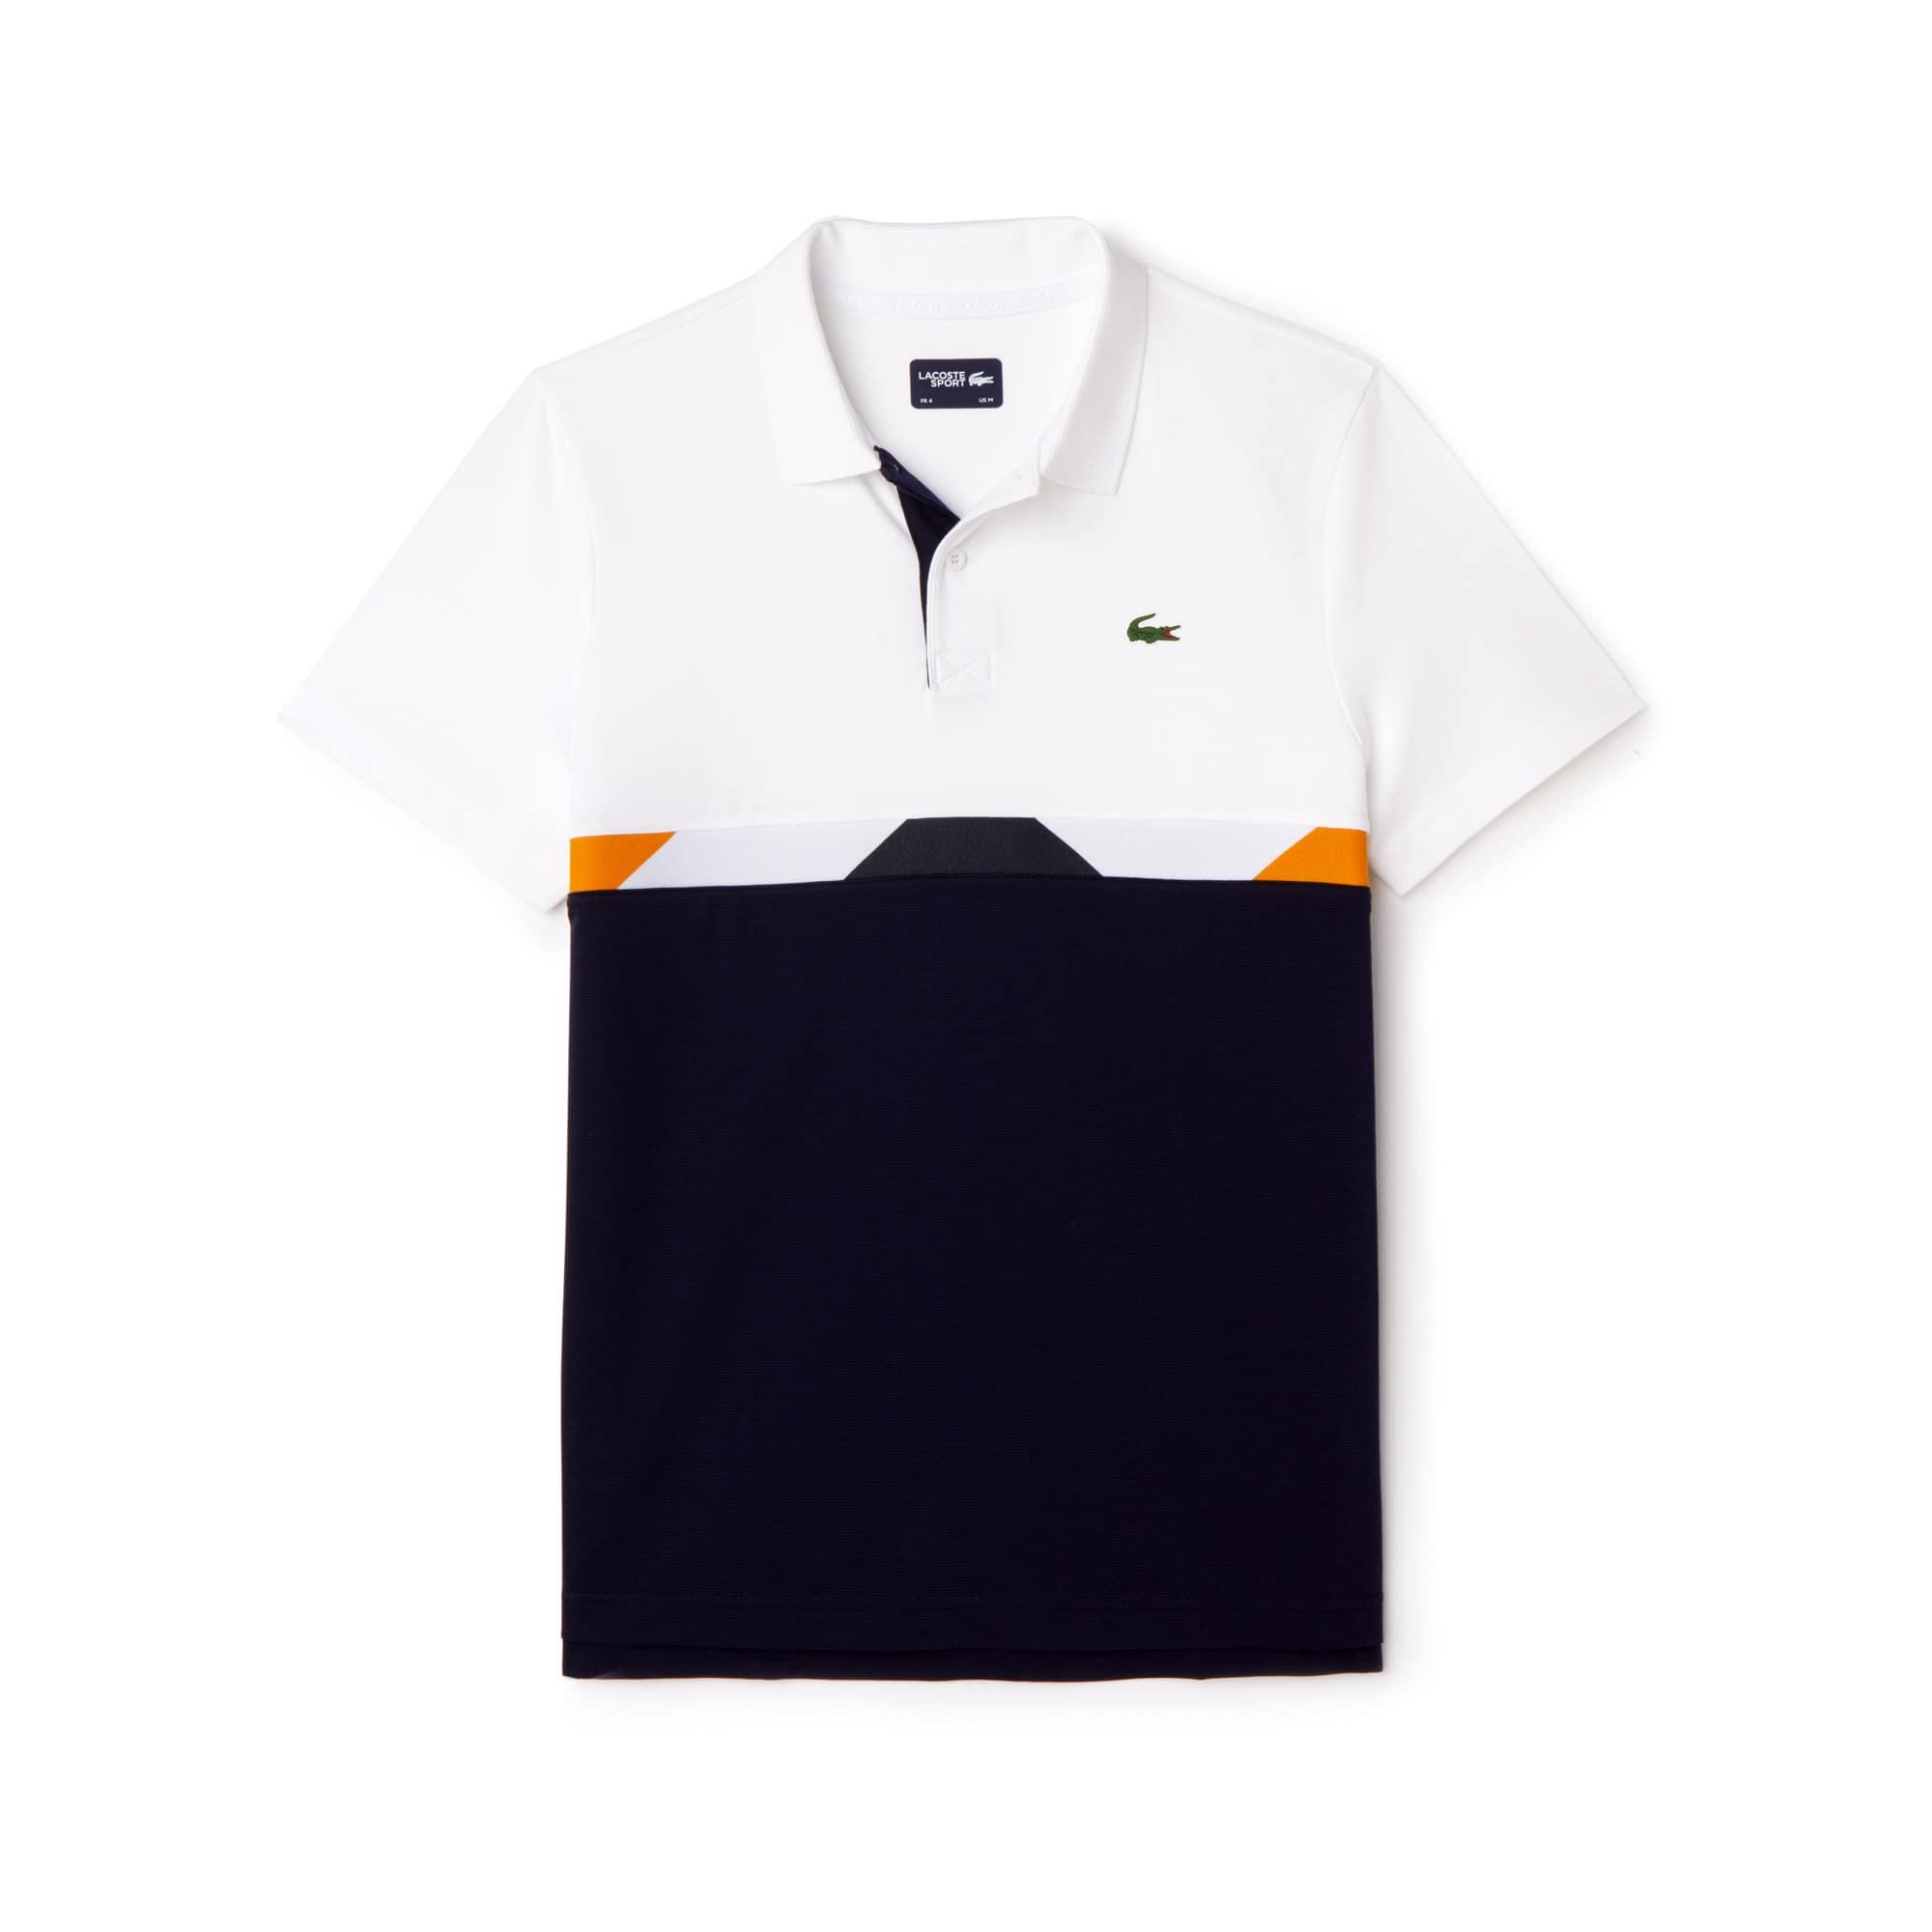 Men's Lacoste SPORT Colorblock Ultra-Light Cotton Tennis Polo